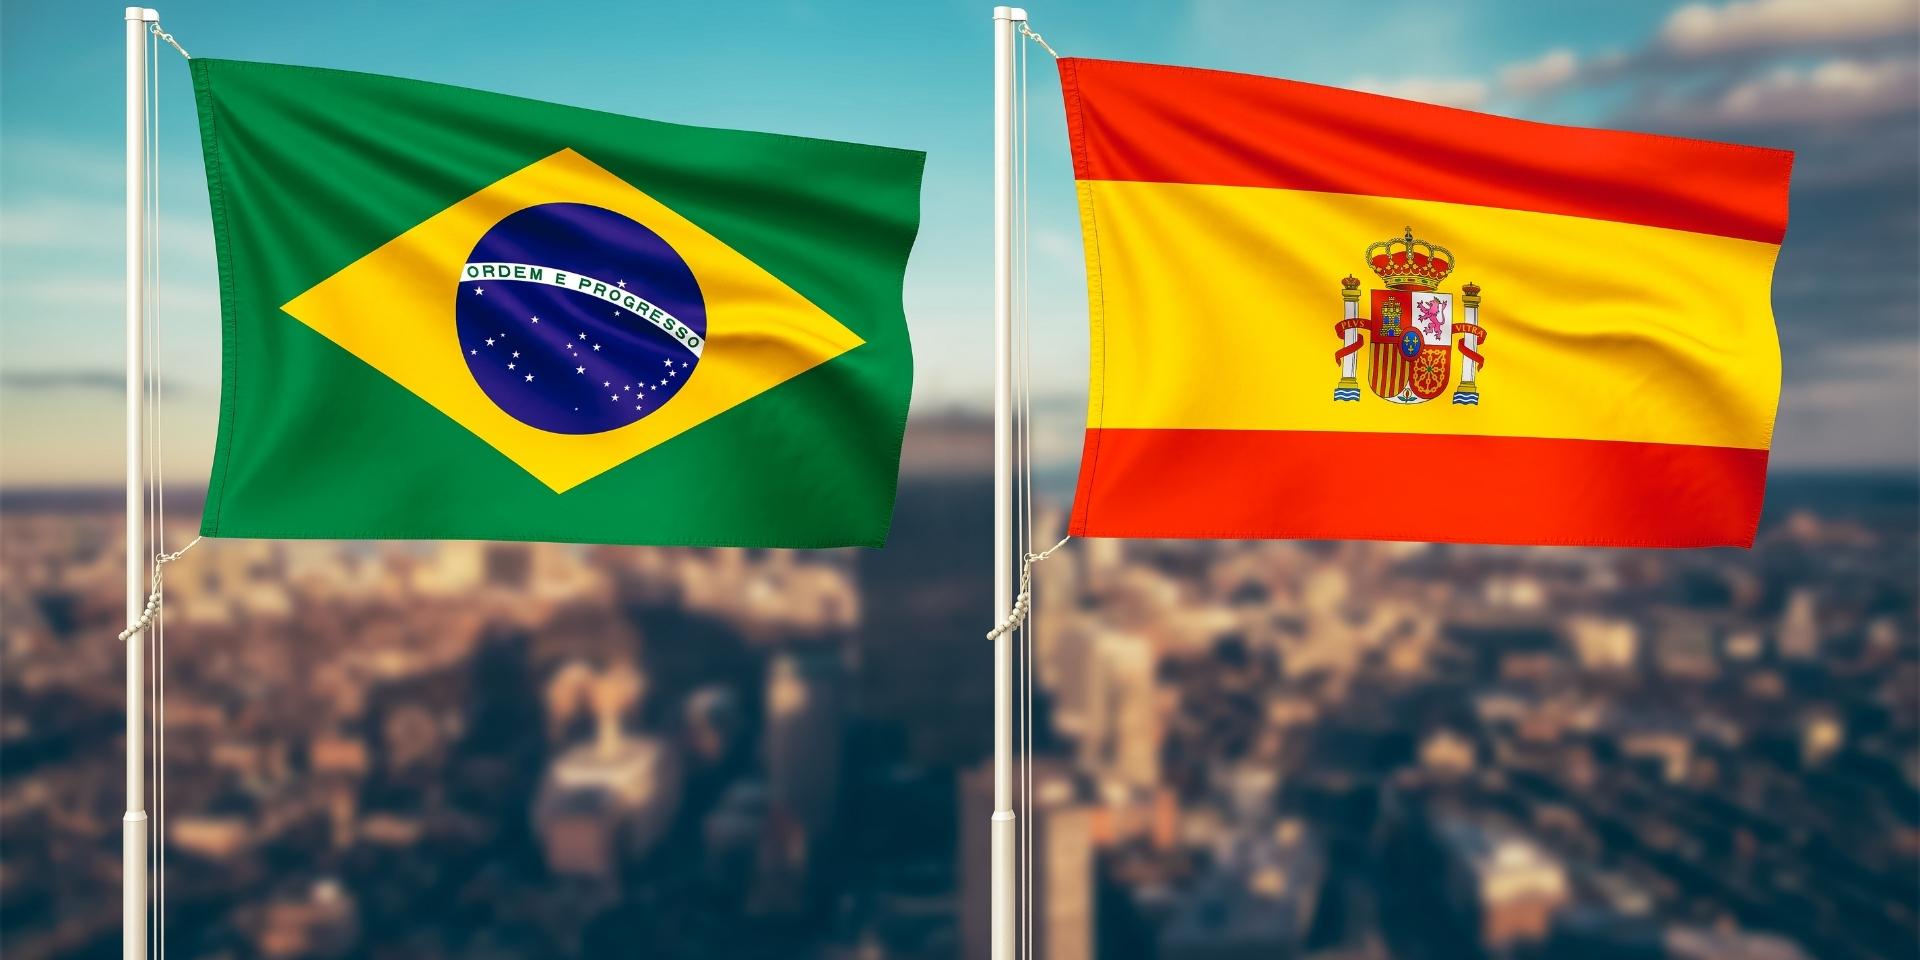 INISEG expande su desarrollo académico a Brasil de la mano de André Fonseca | Iniseg